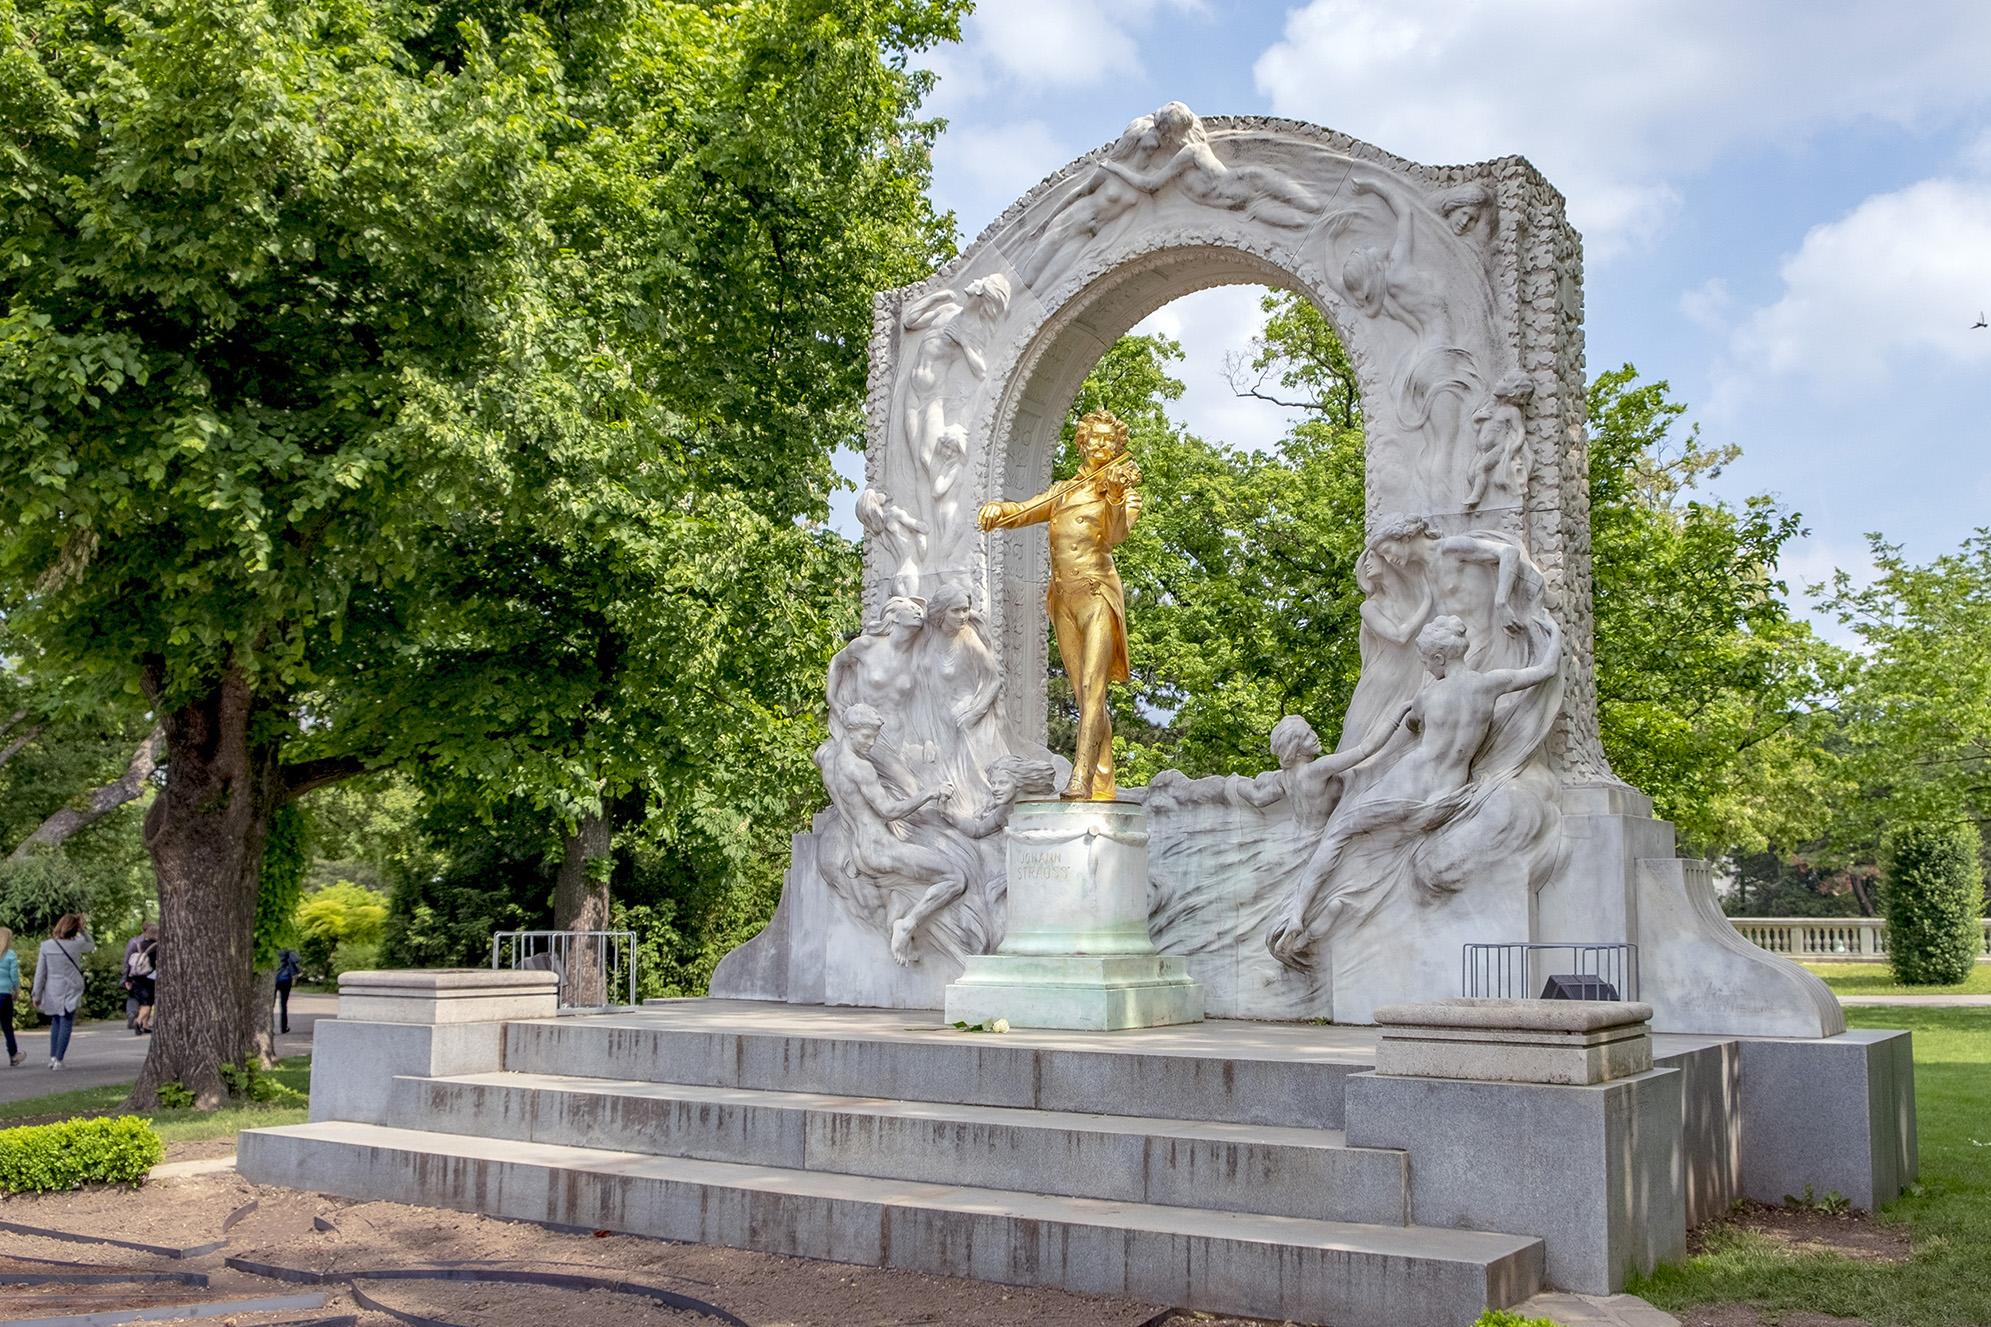 Johann Strauss, en av de mest fotograferade statyerna i Wien.